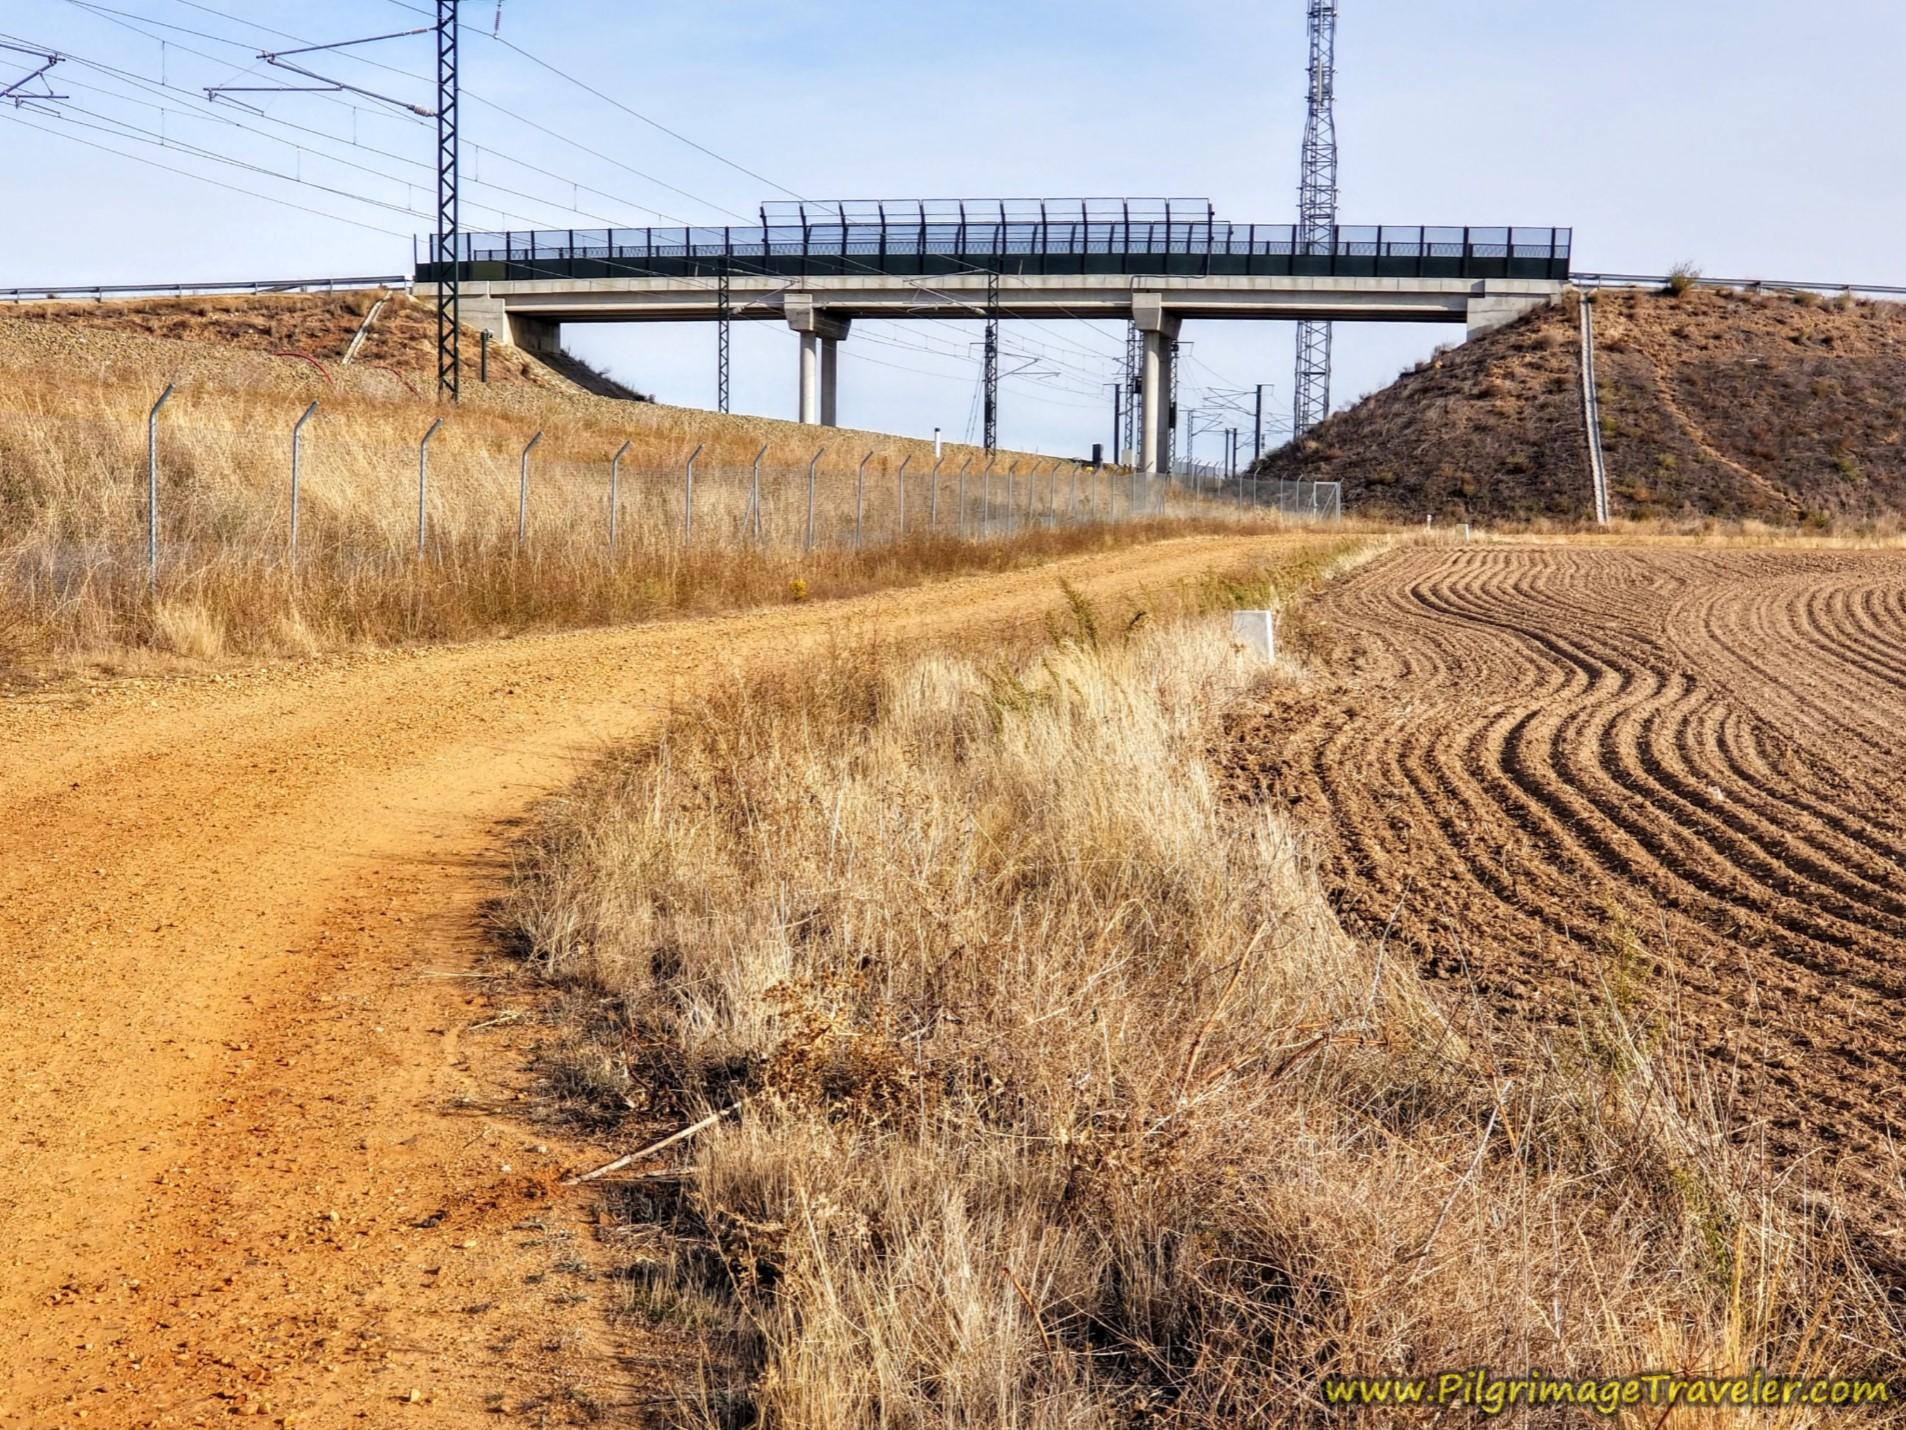 Begin Detour Before Overpass